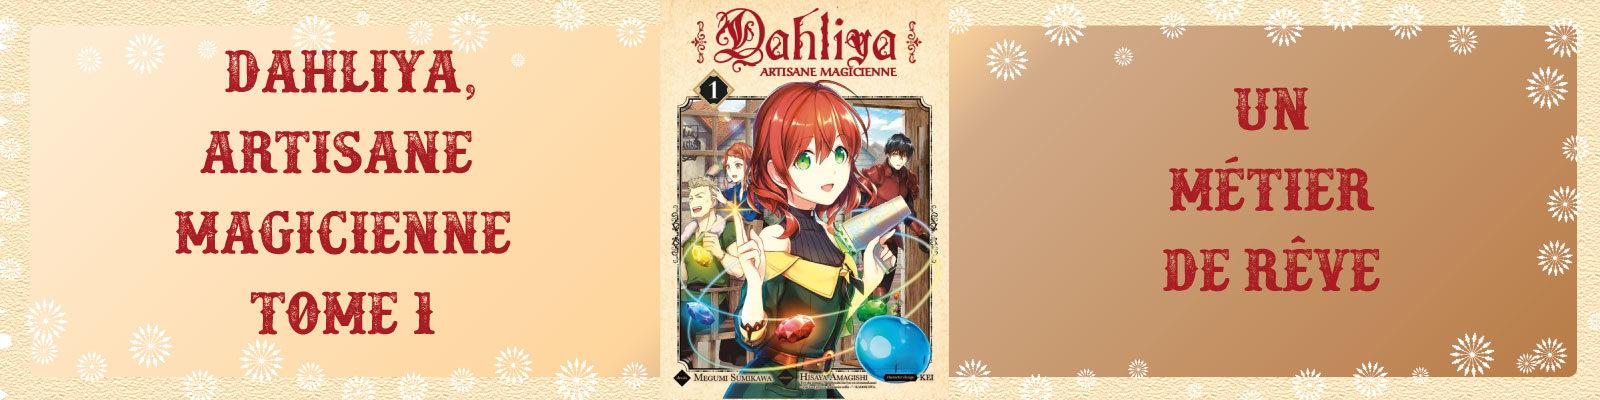 Dahliya,-Artisane-Magicienne-Vol.-1